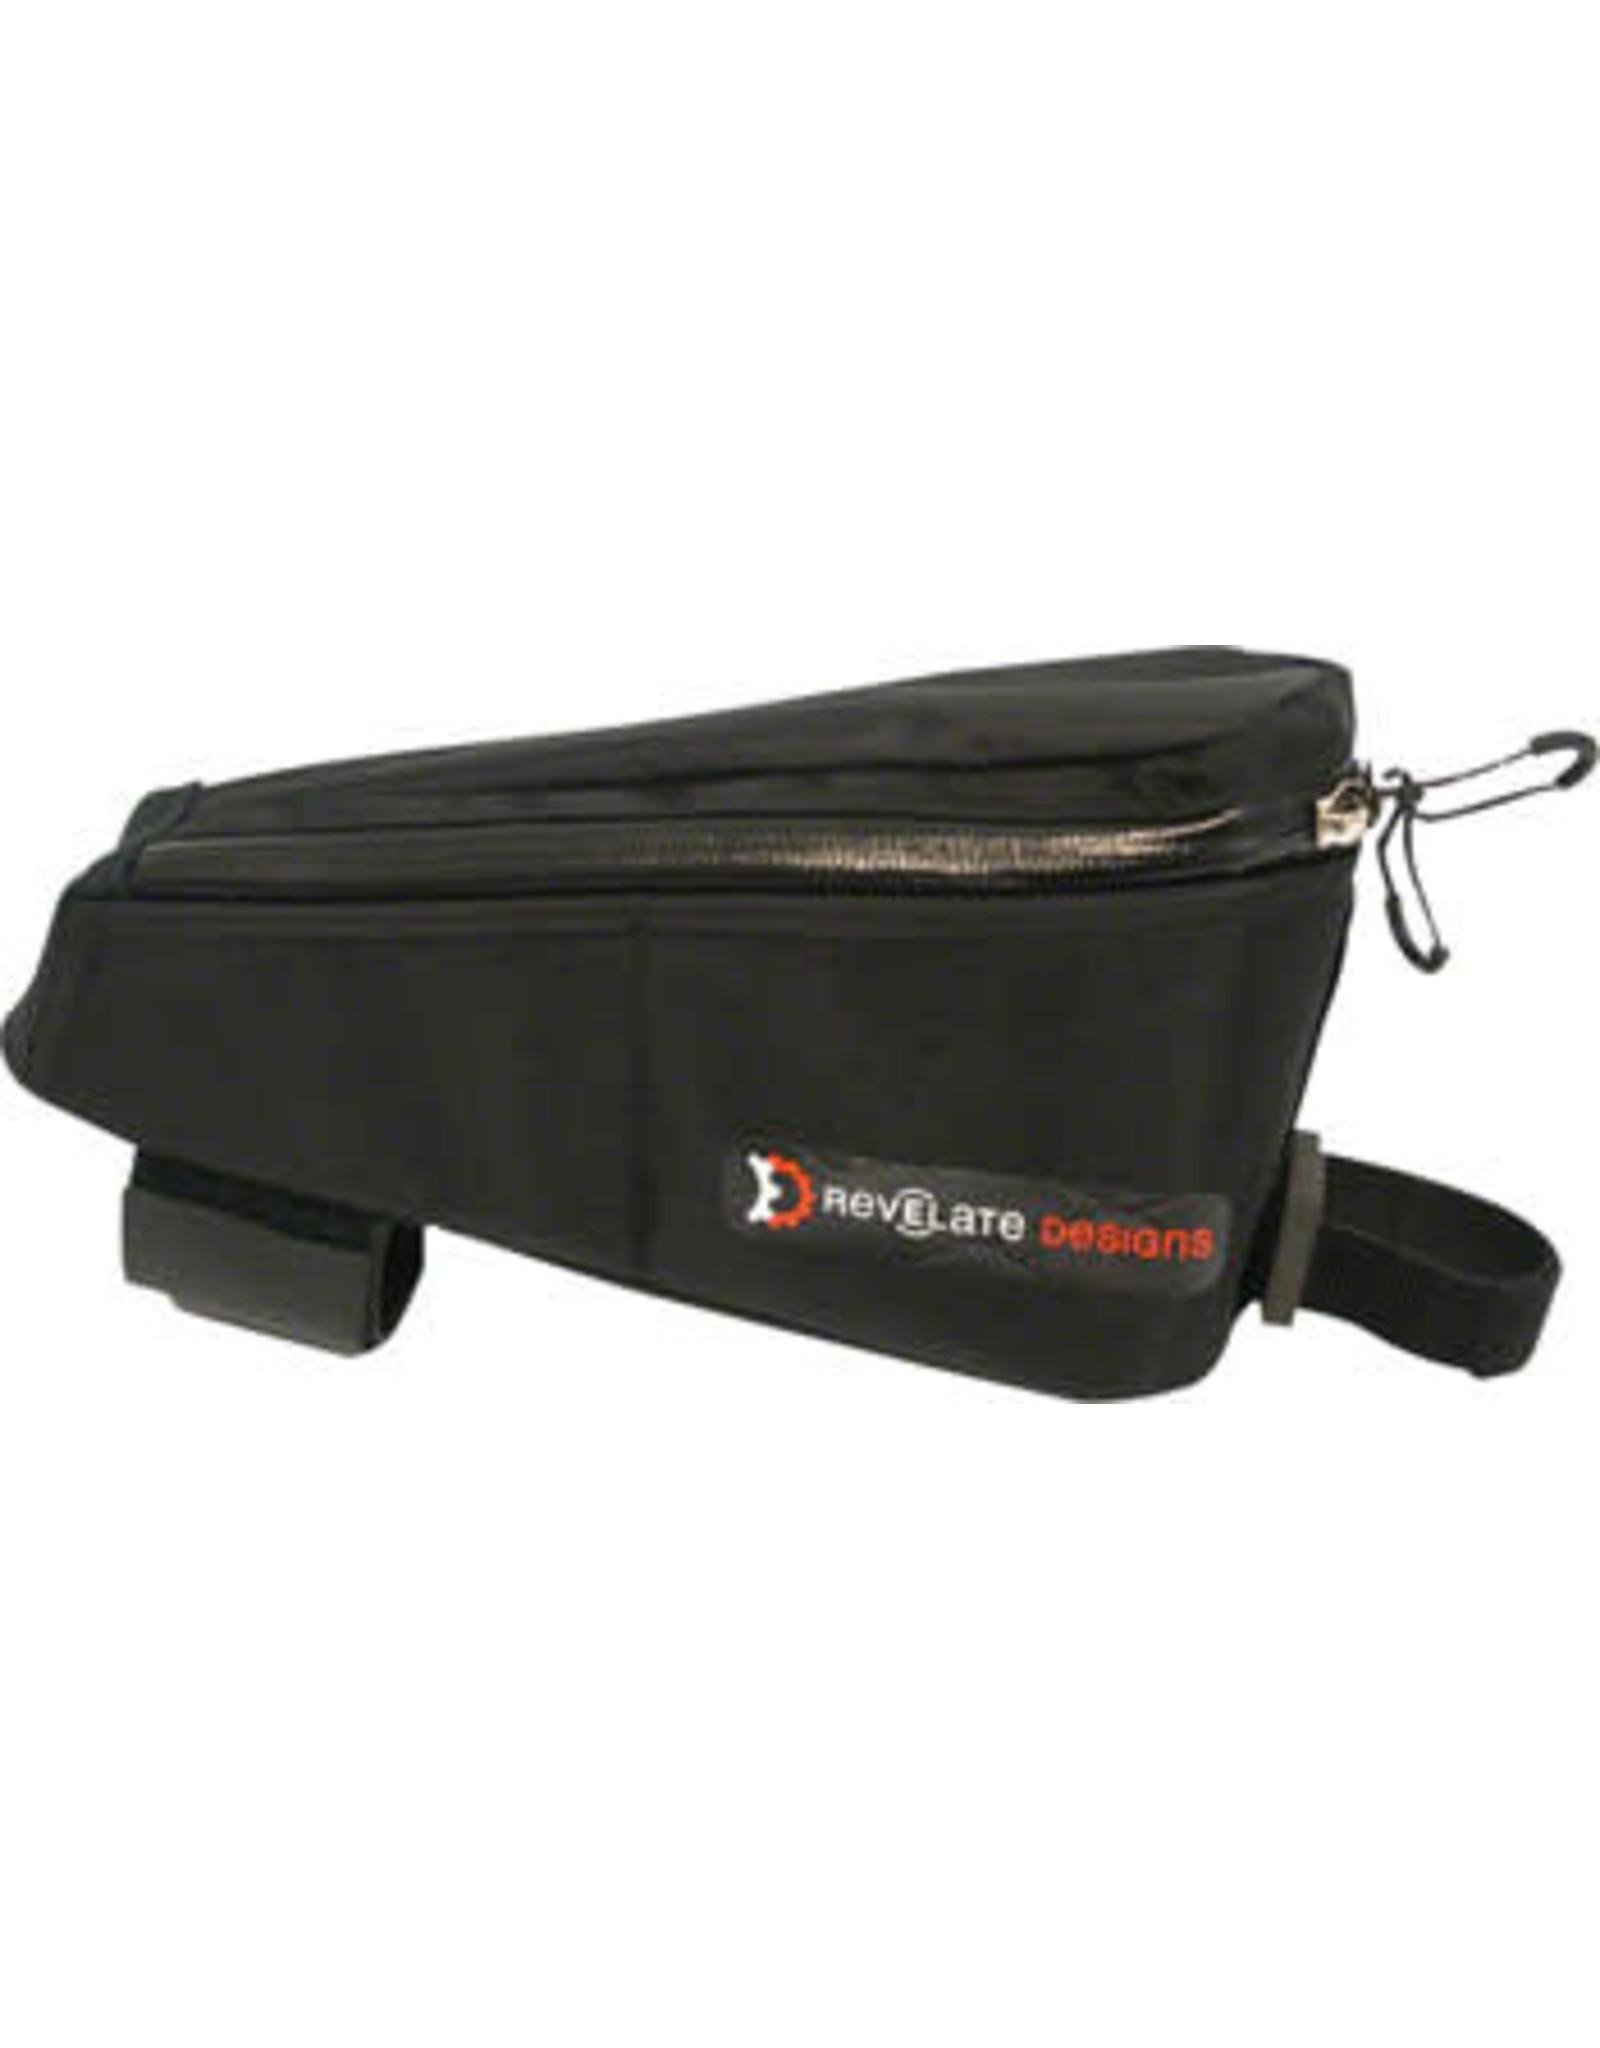 Revelate Designs Revelate Designs Gas Tank Top Tube Stem Bag Black